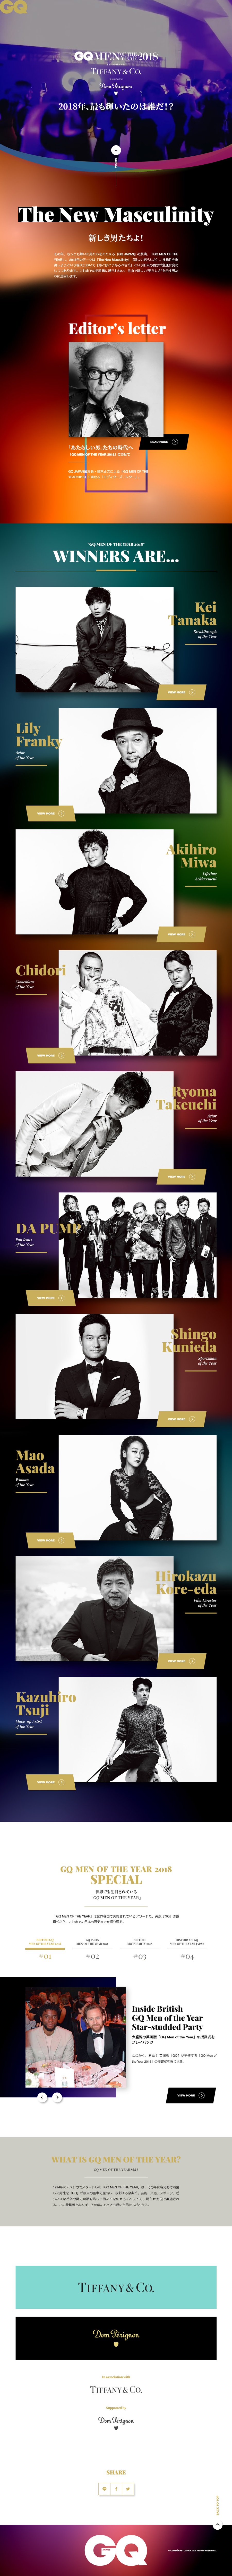 GQ MEN OF THE YEAR 2018 | GQ JAPAN